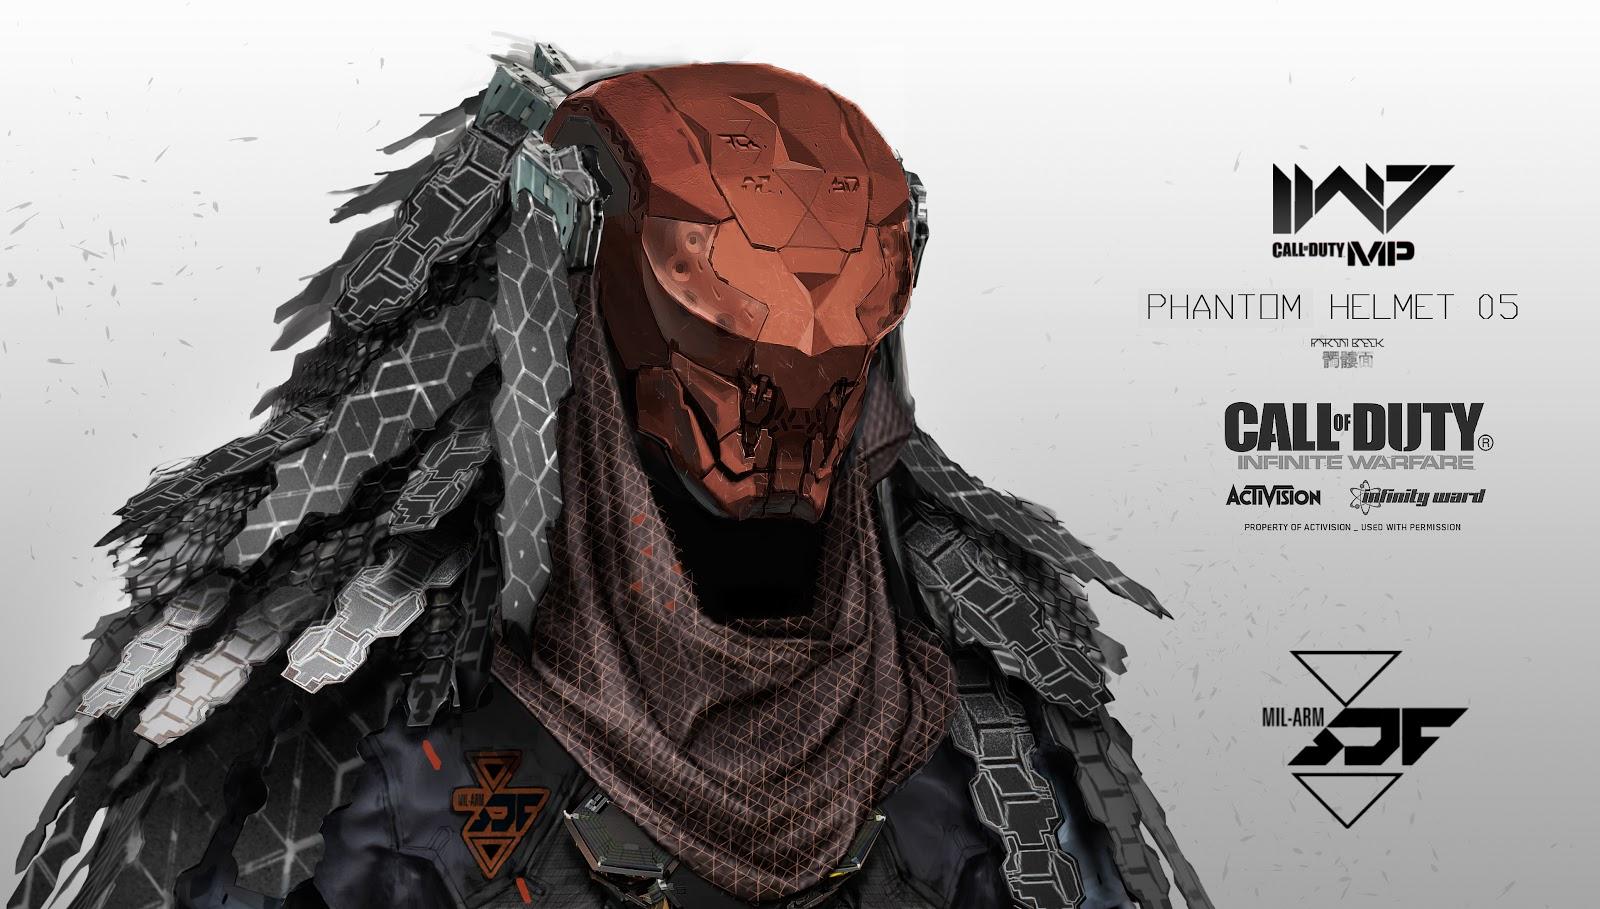 CODIW_Phantom_head5_01.jpg